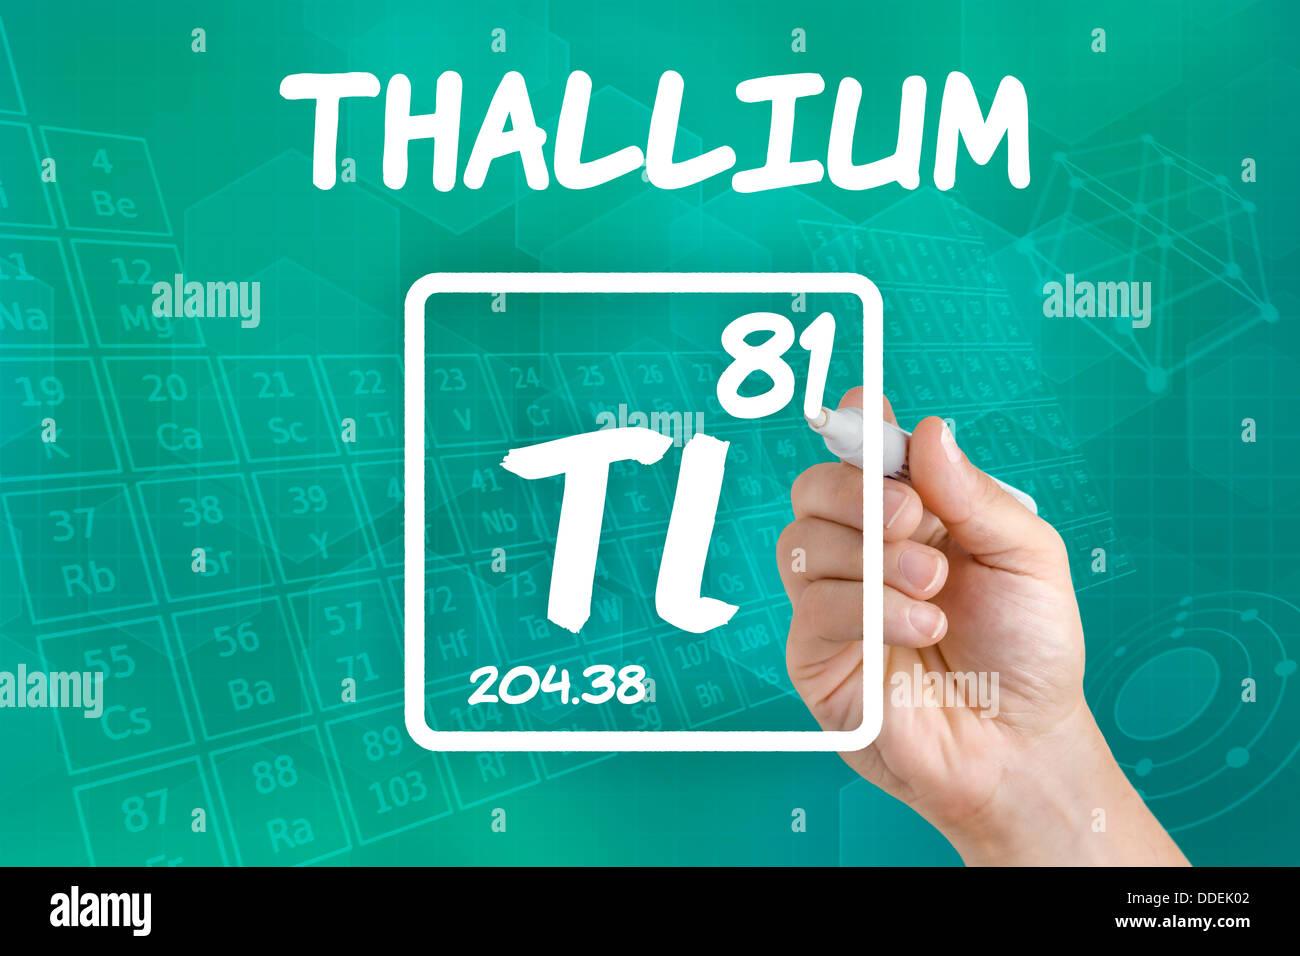 Symbol for the chemical element thallium stock photo 59943858 alamy symbol for the chemical element thallium urtaz Choice Image